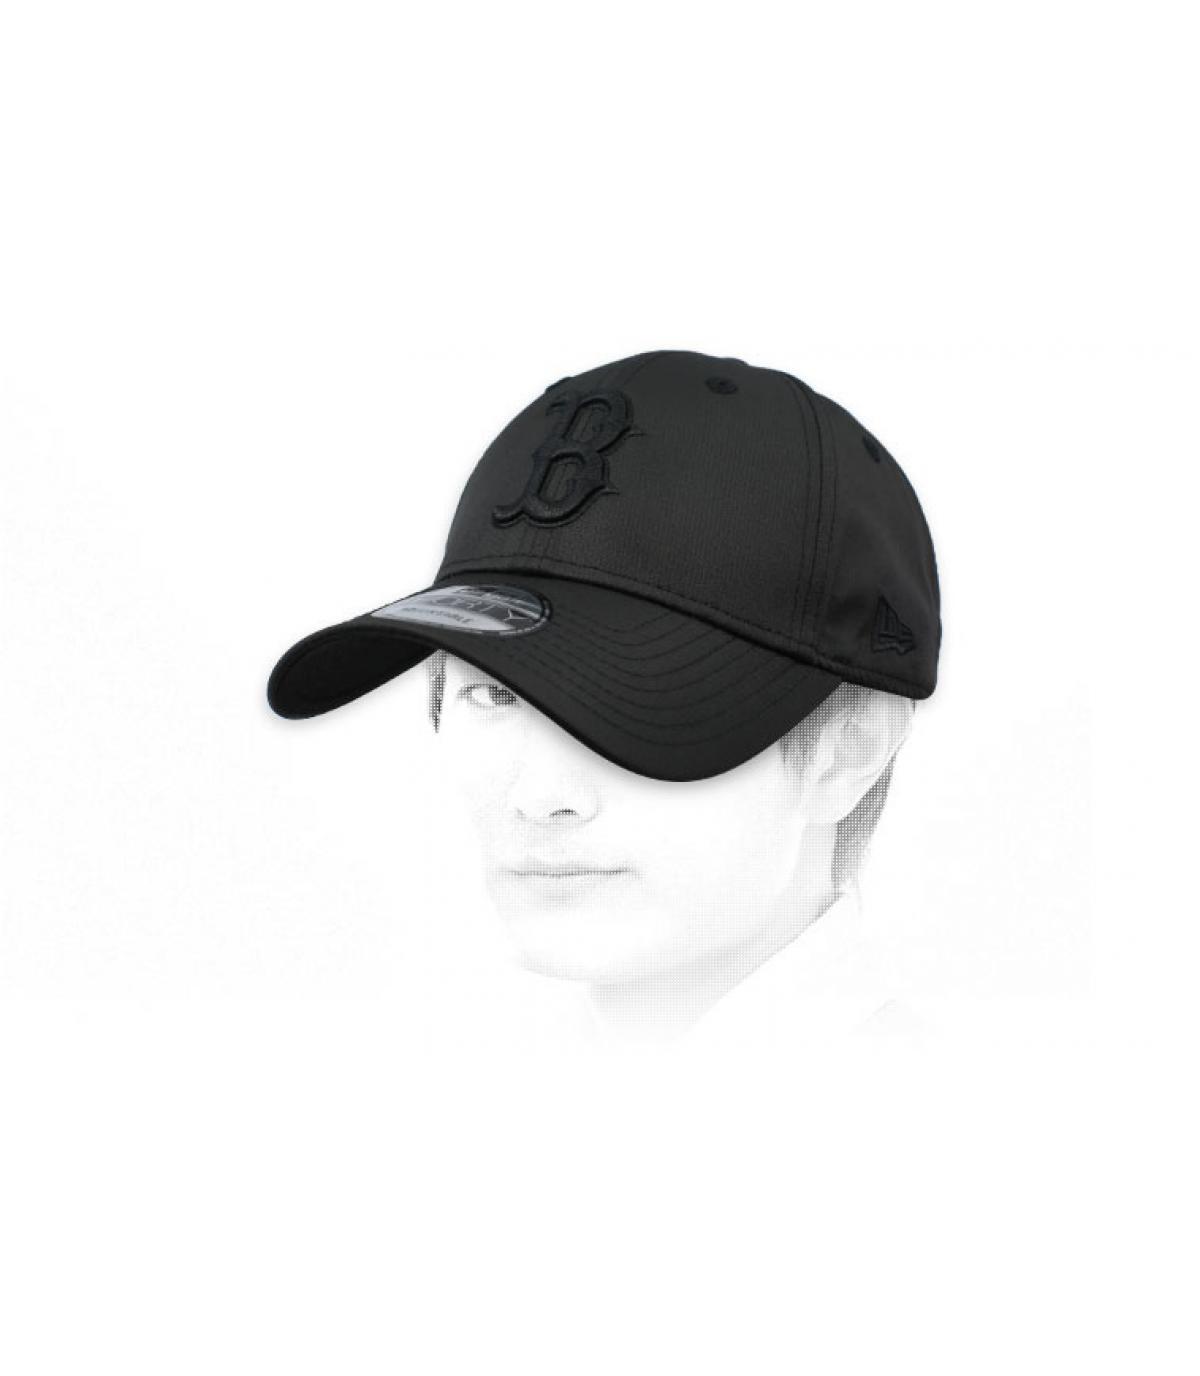 casquette B noir ripstop